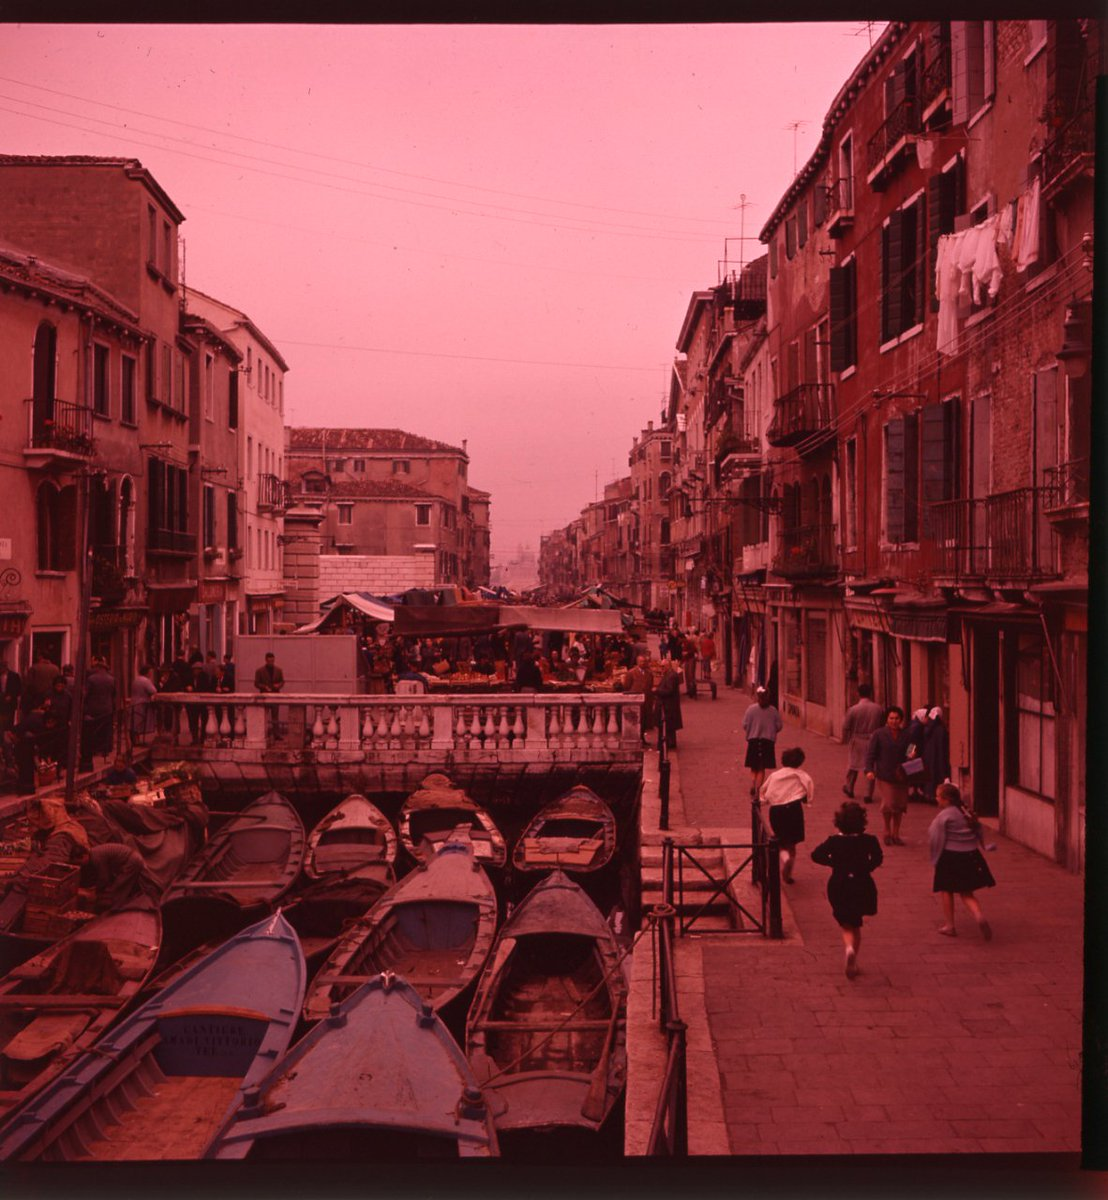 Iveser Venezia's photo on Garibaldi